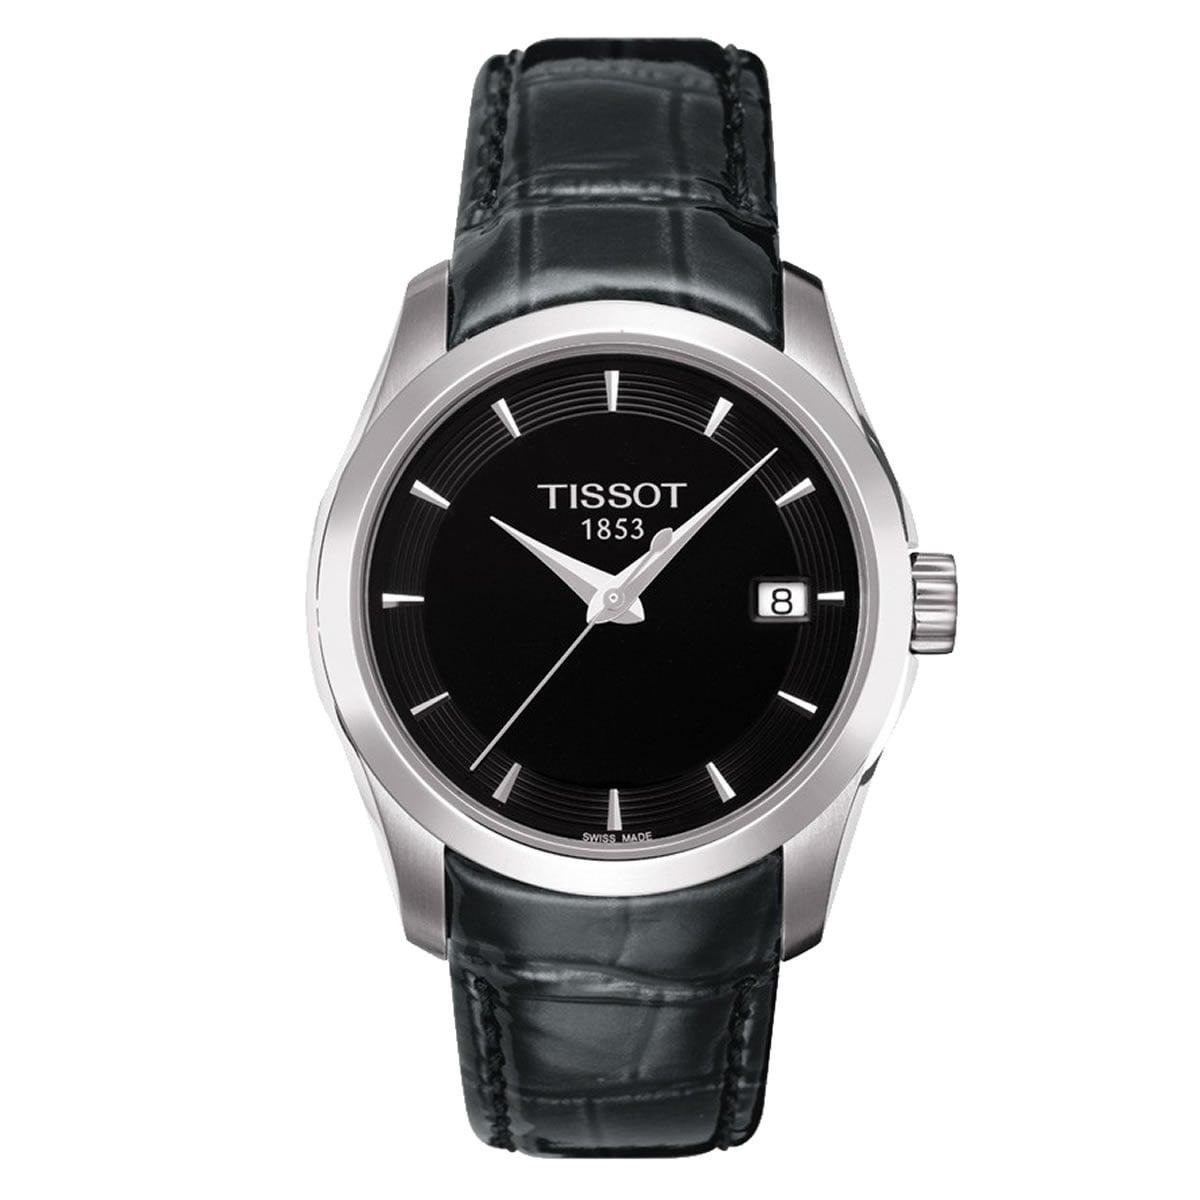 Tissot(ティソ) Couturier(クチュリエ )t0352101605100